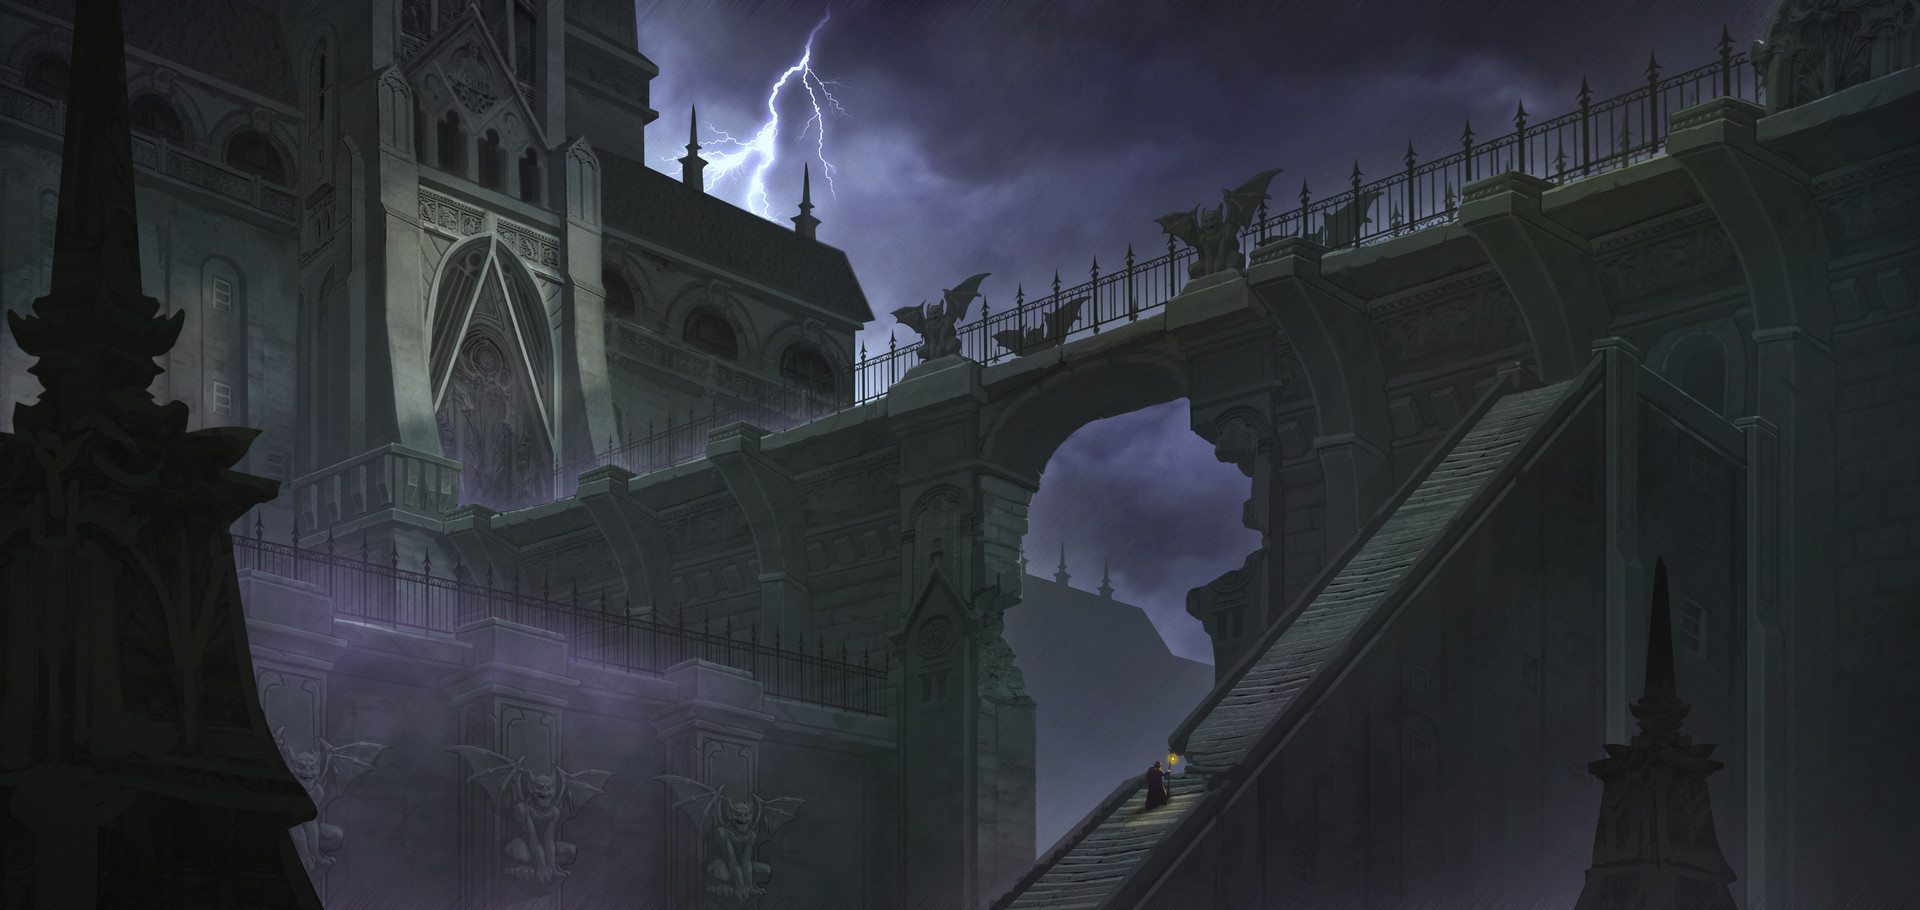 Danny huynh danny huynh illustration castle2